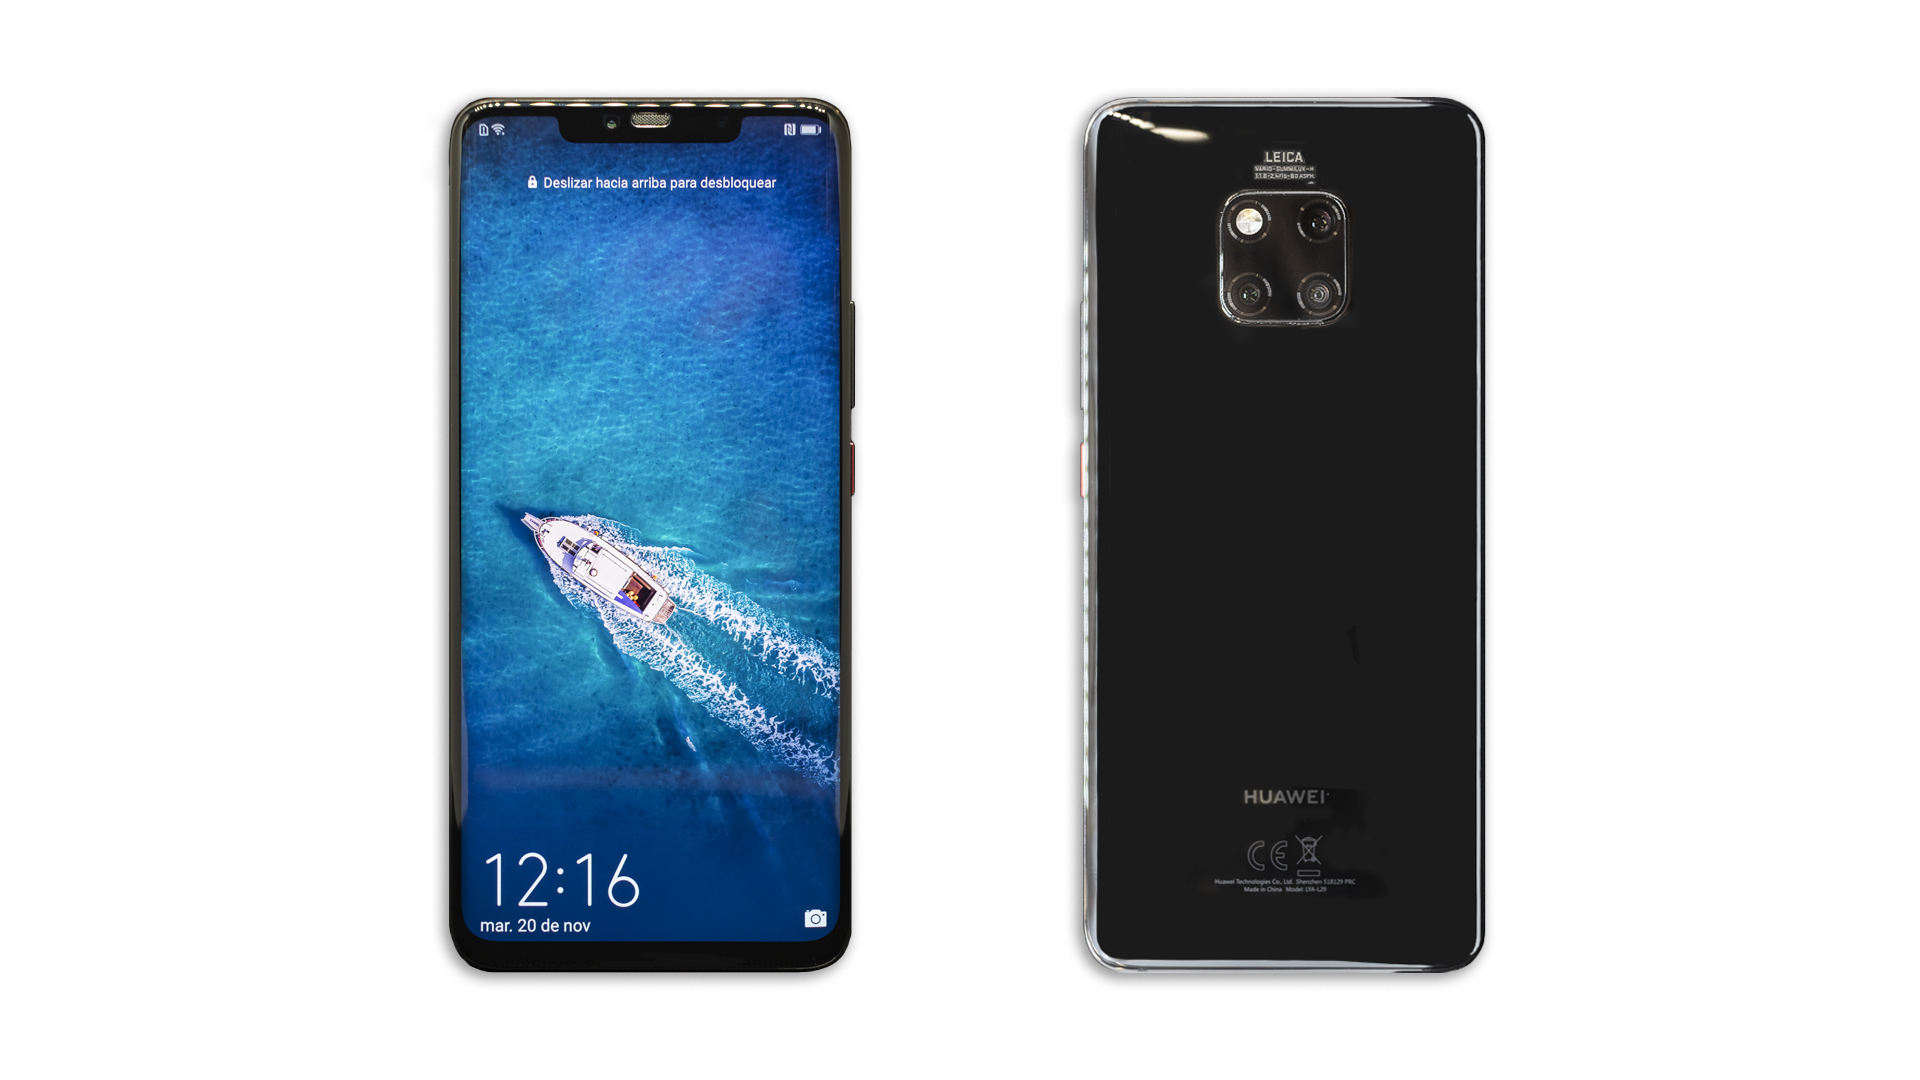 Reseña | Huawei Mate 20 Pro, ¿la perfección china llegó a su máximo?